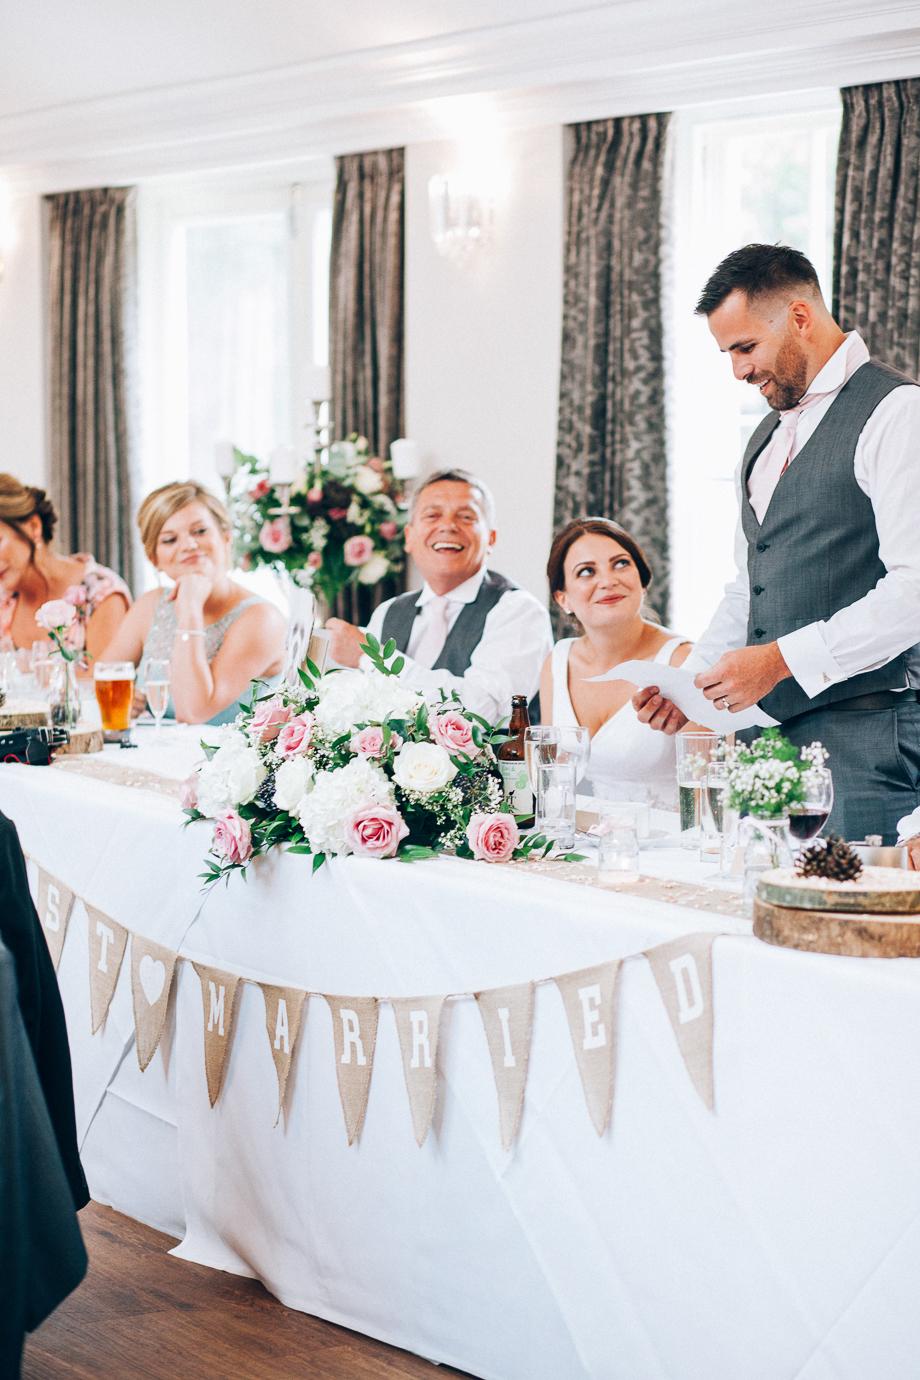 Barton-Hall-Wedding-035